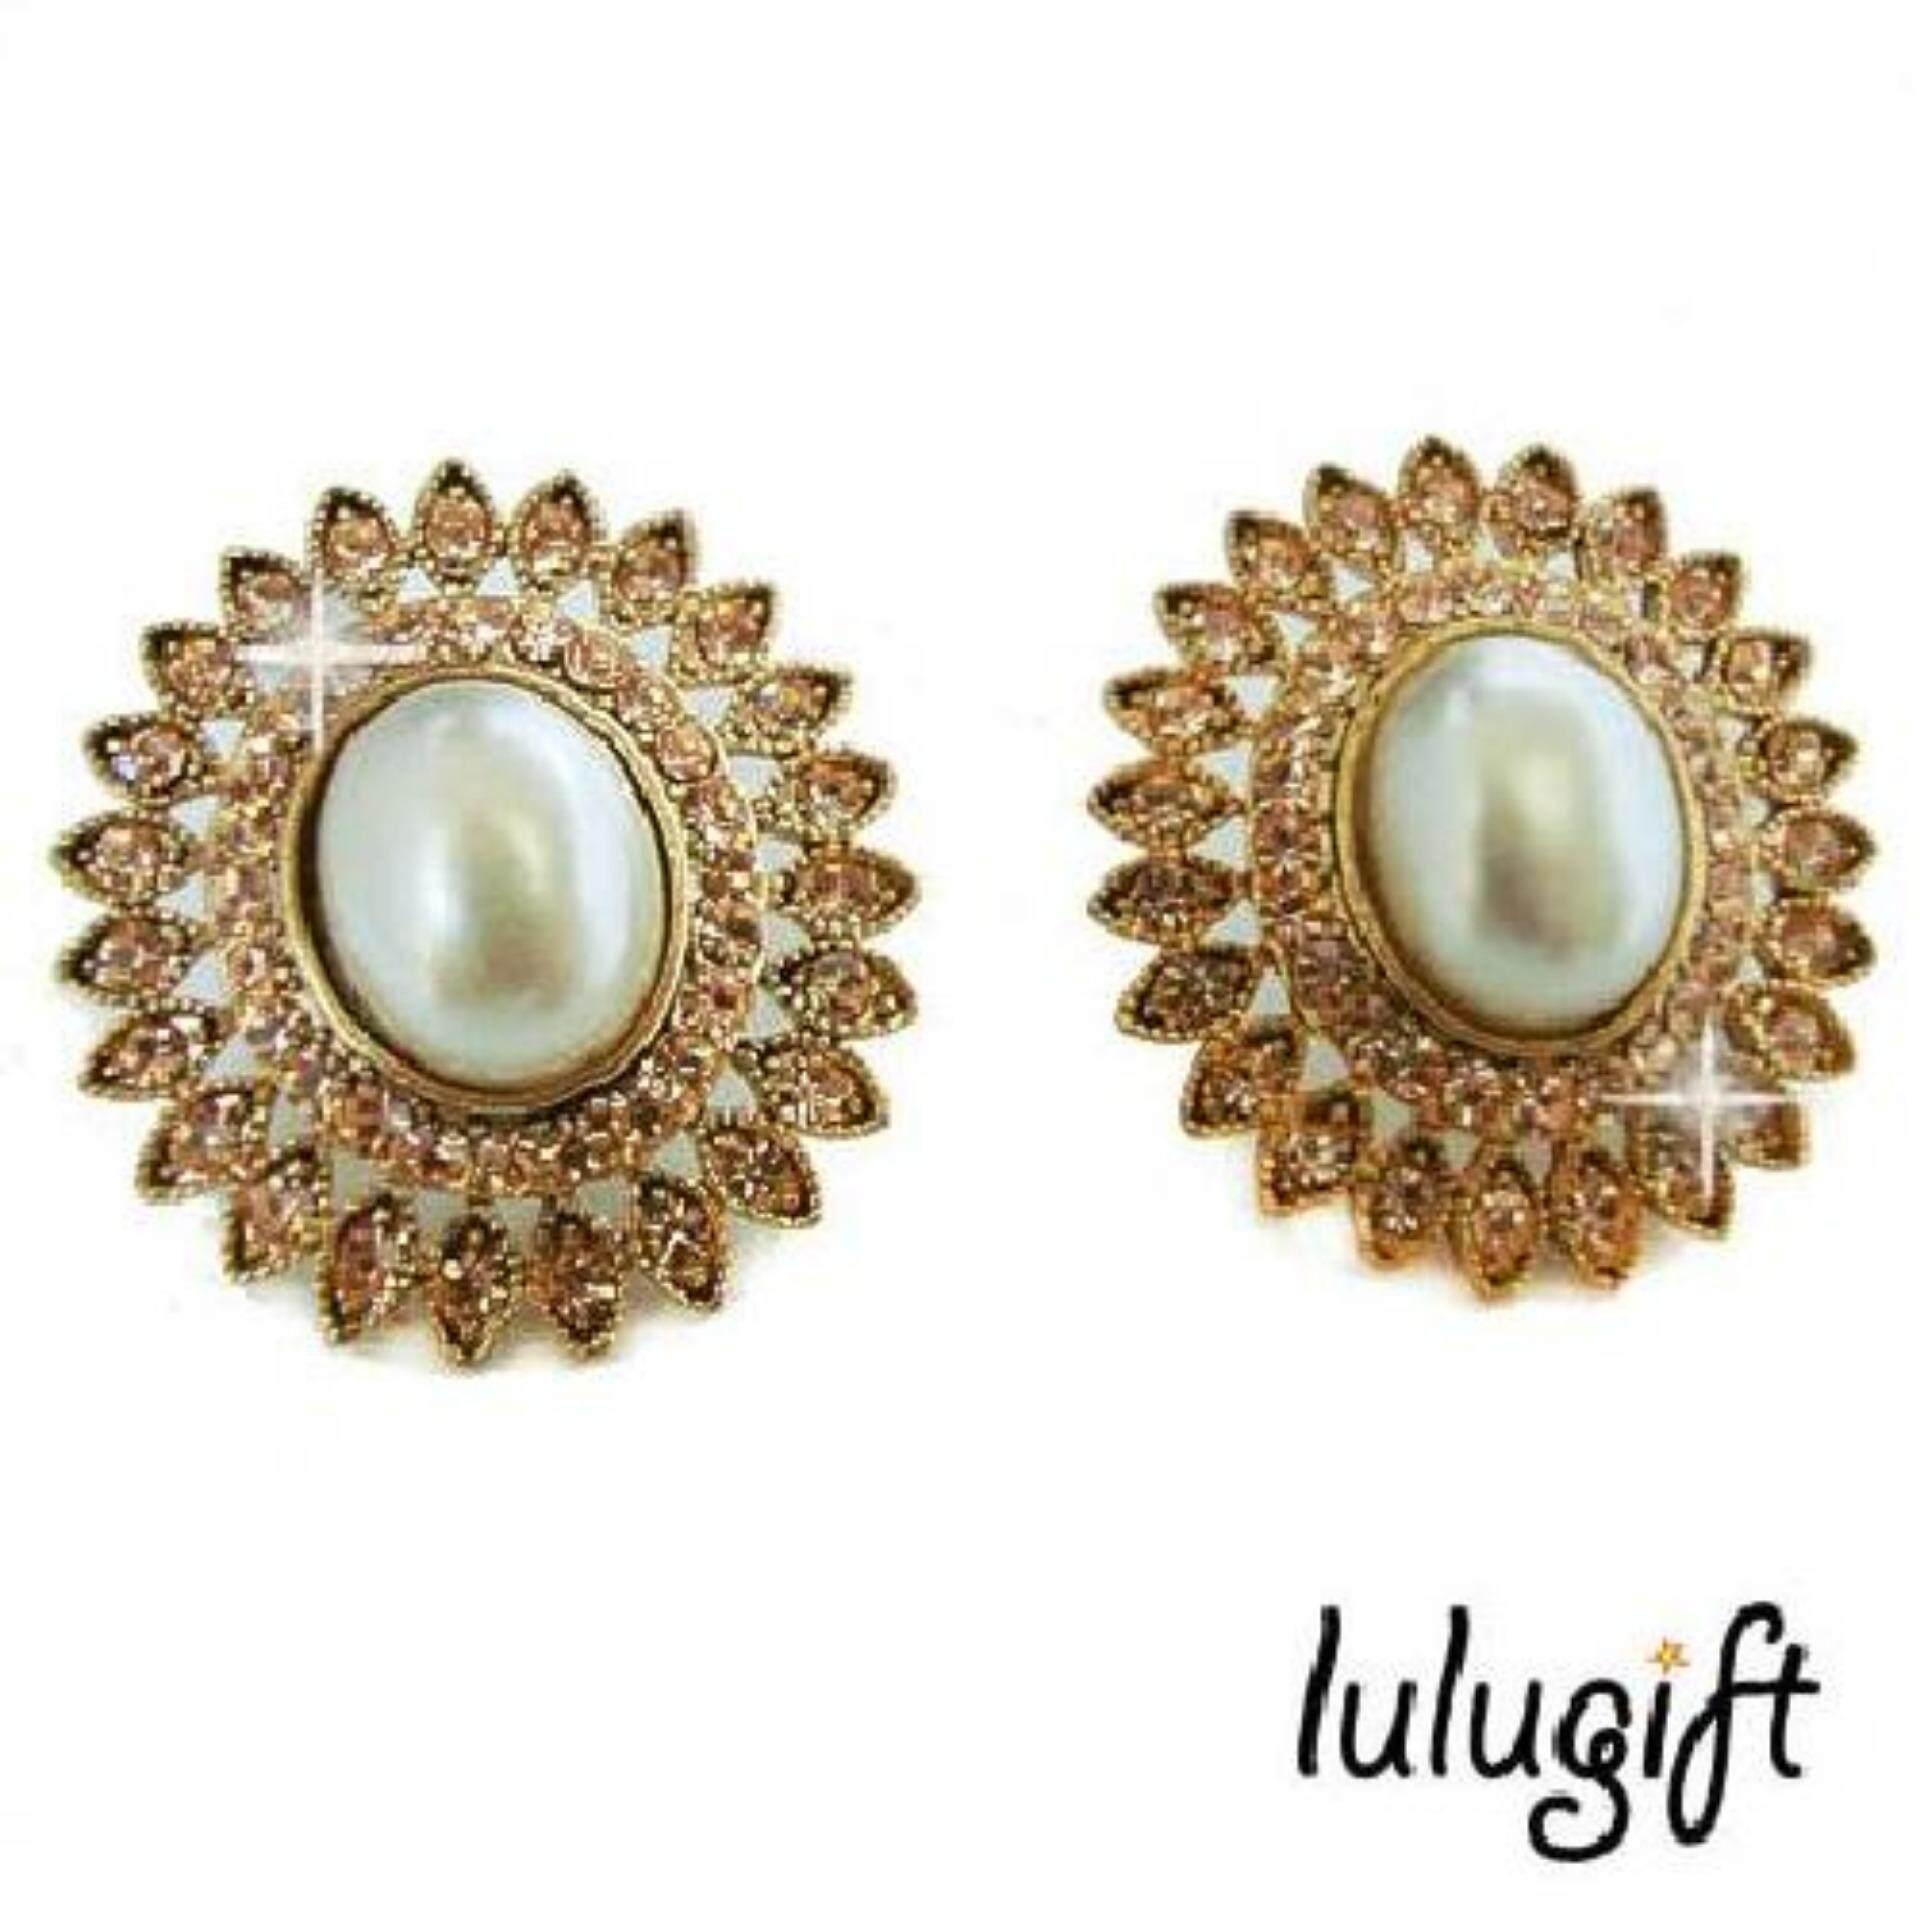 e01d84f85 Lulugift European Design Beautiful Sun Flower Pearl Swarovski Earring e2309